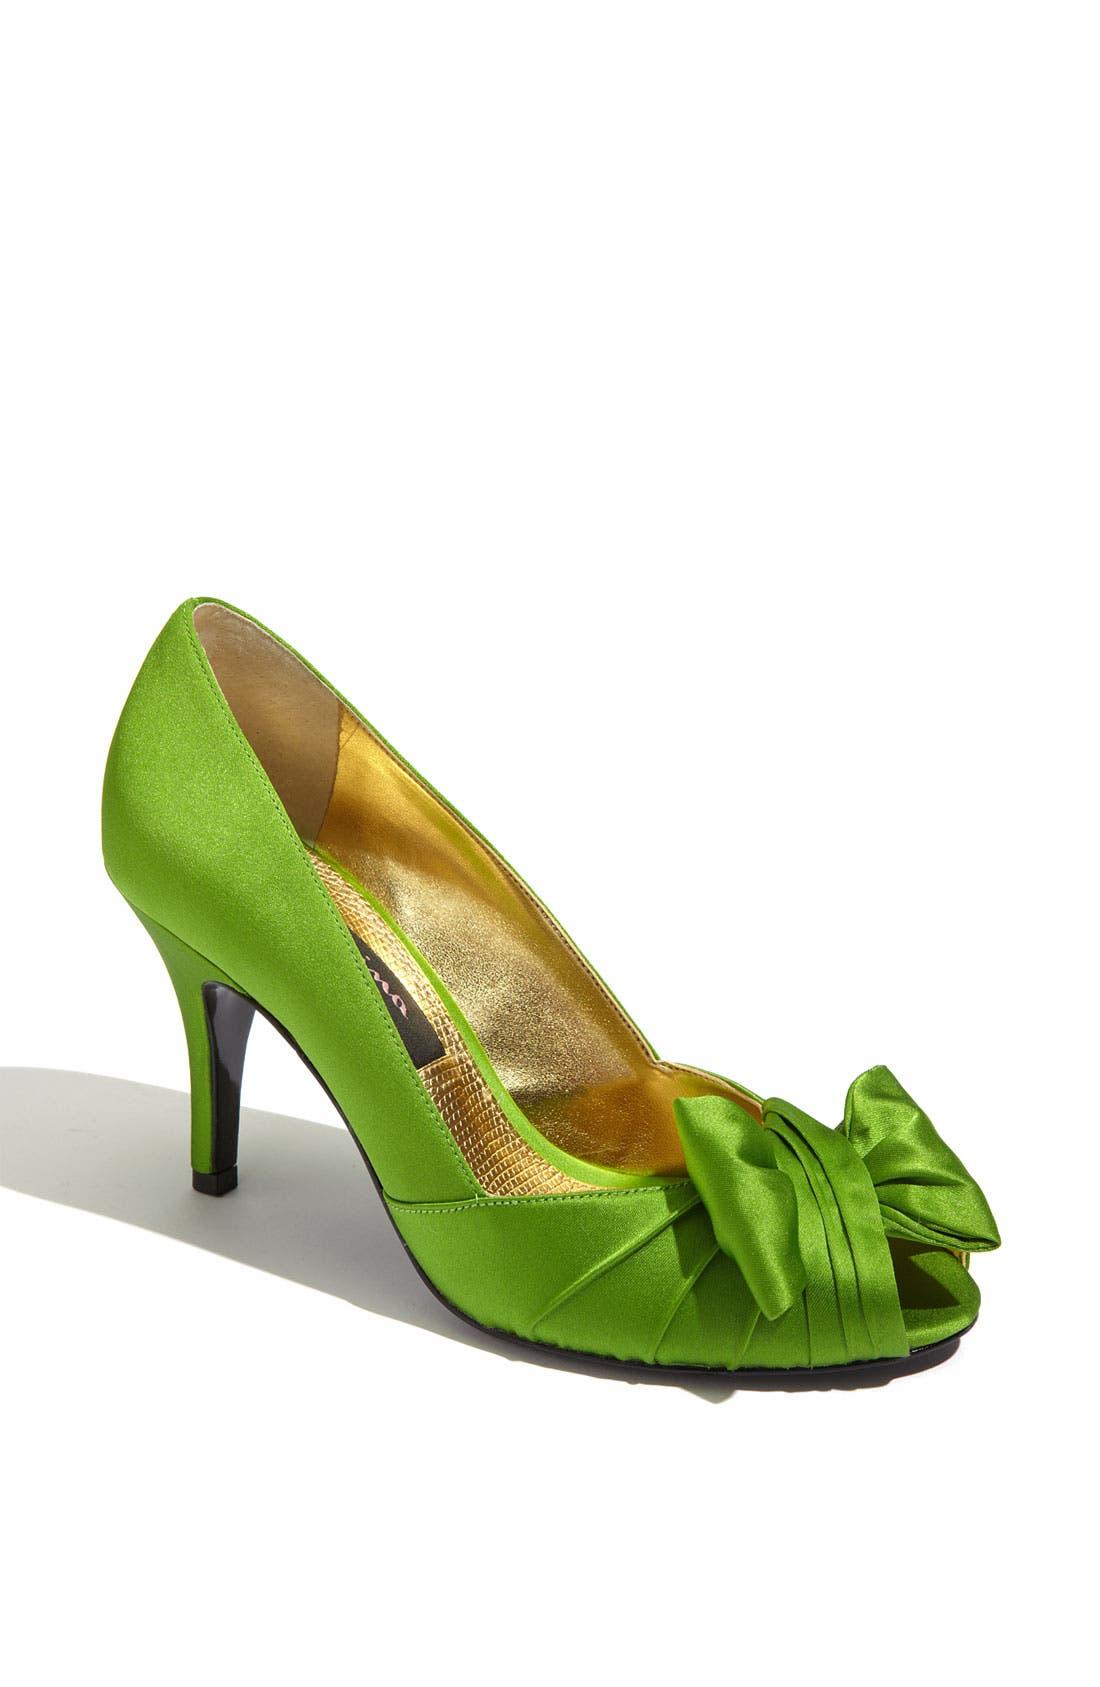 Alternate Image 1 Selected - Nina 'Forbes' Peep Toe Pump (Women)